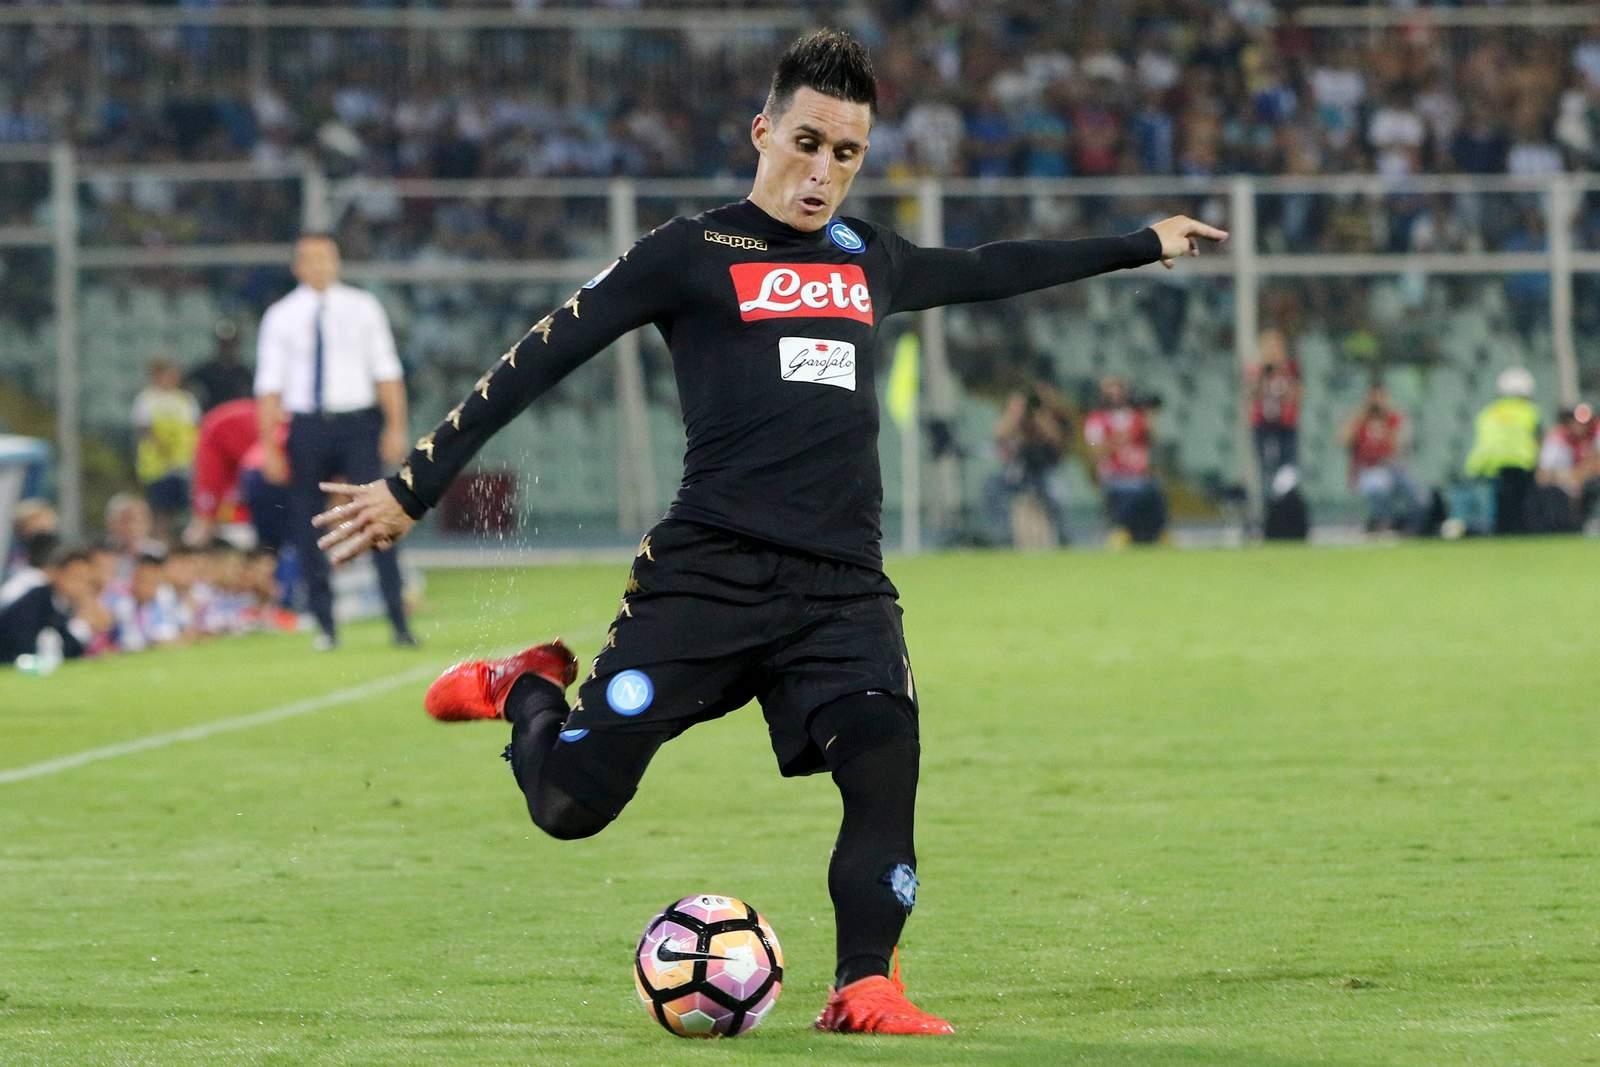 José Callejon zieht ab. Jetzt auf Neapel gegen Besiktas wetten!